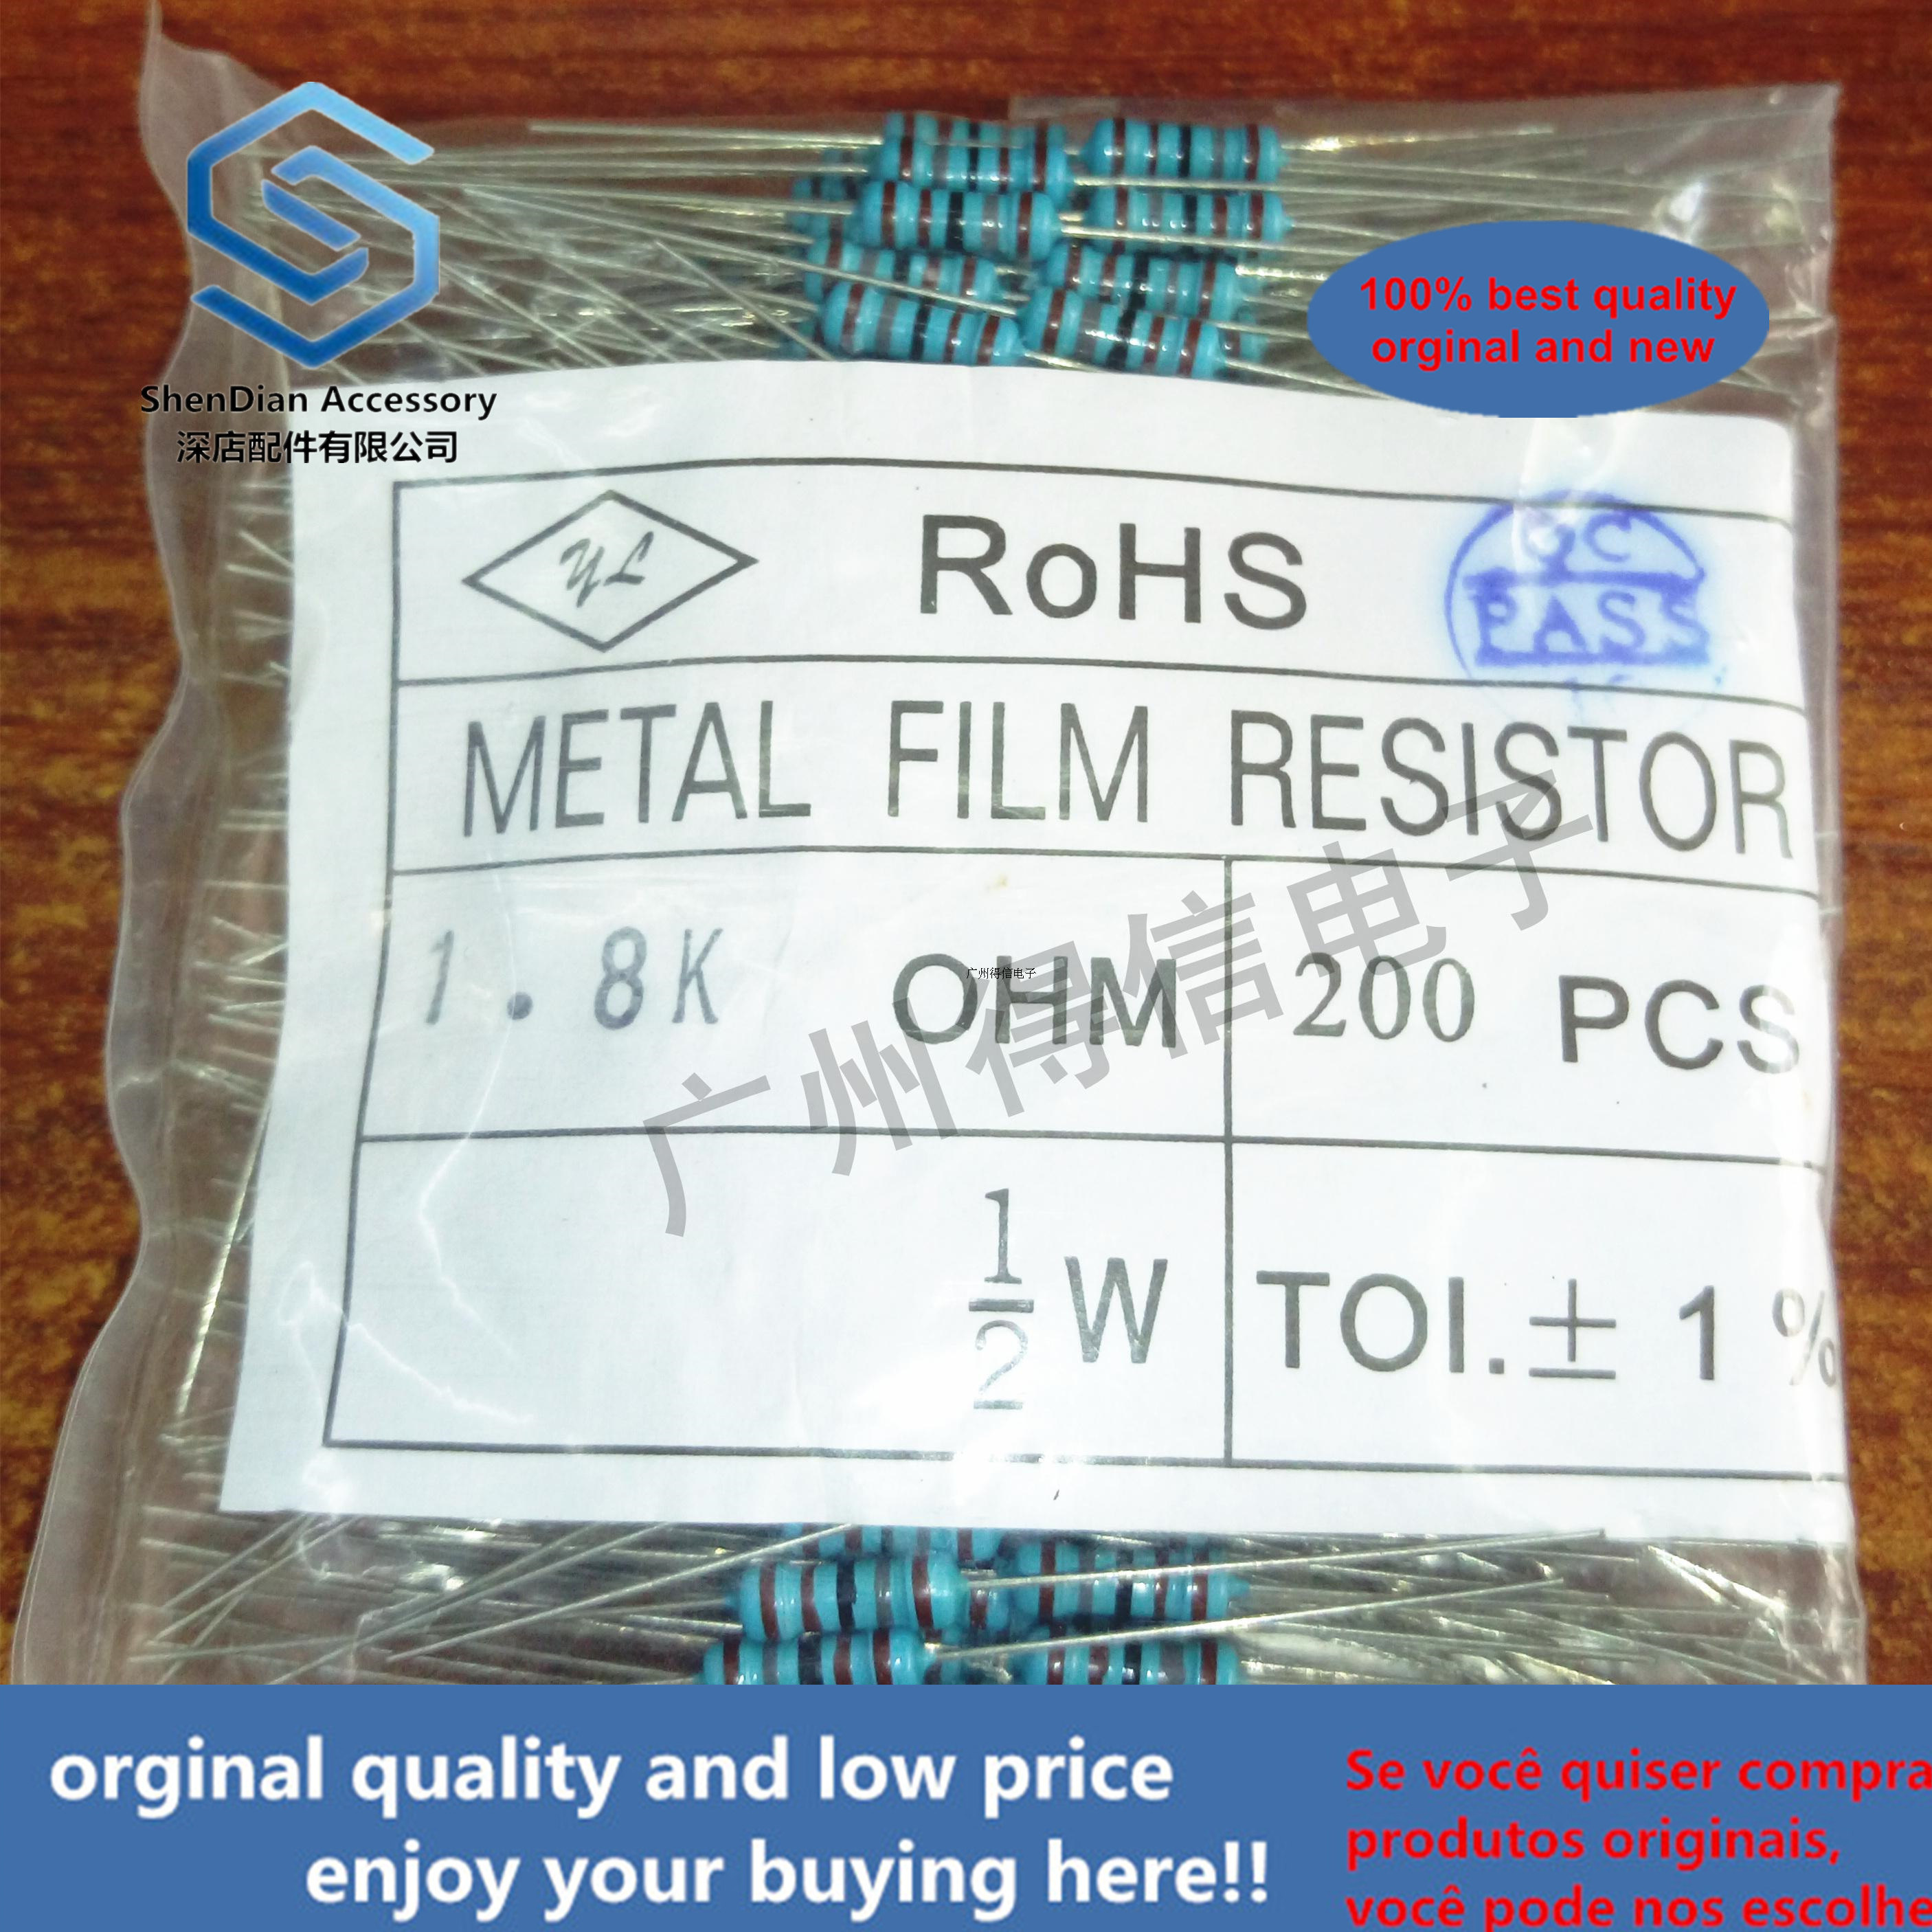 200pcs 1 / 2W 2.2M 1% Brand New Metal Film Iron Feet Resistance Bag Pack 200 Pcs